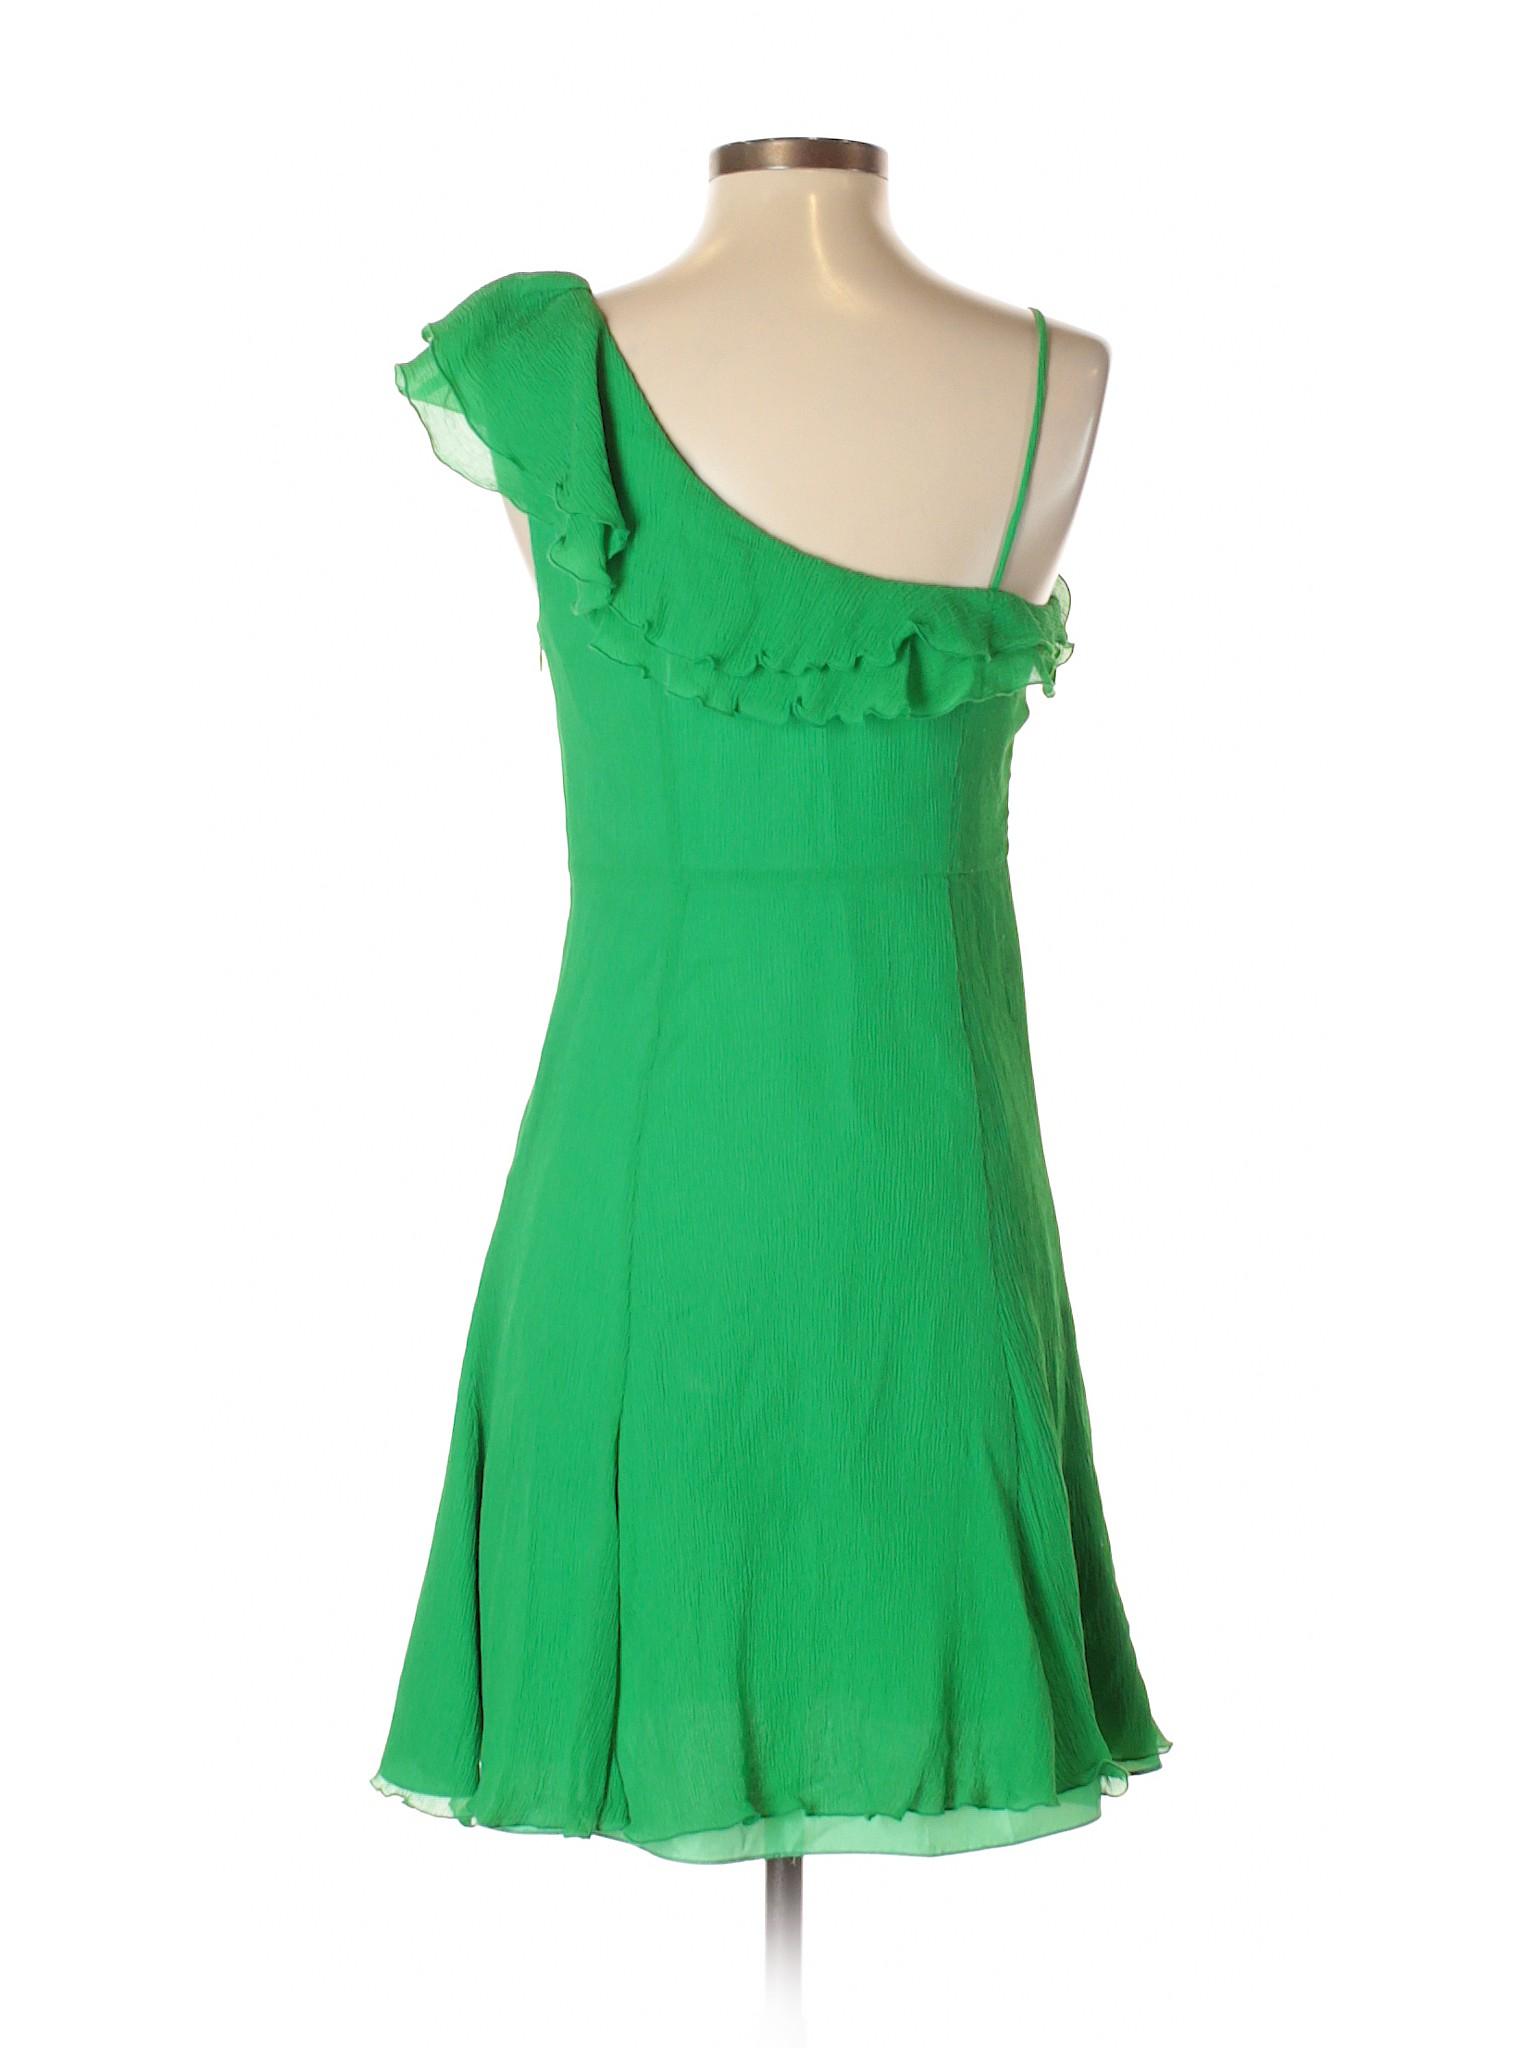 Casual Exchange winter Dress Armani Boutique wfqp0T7xx